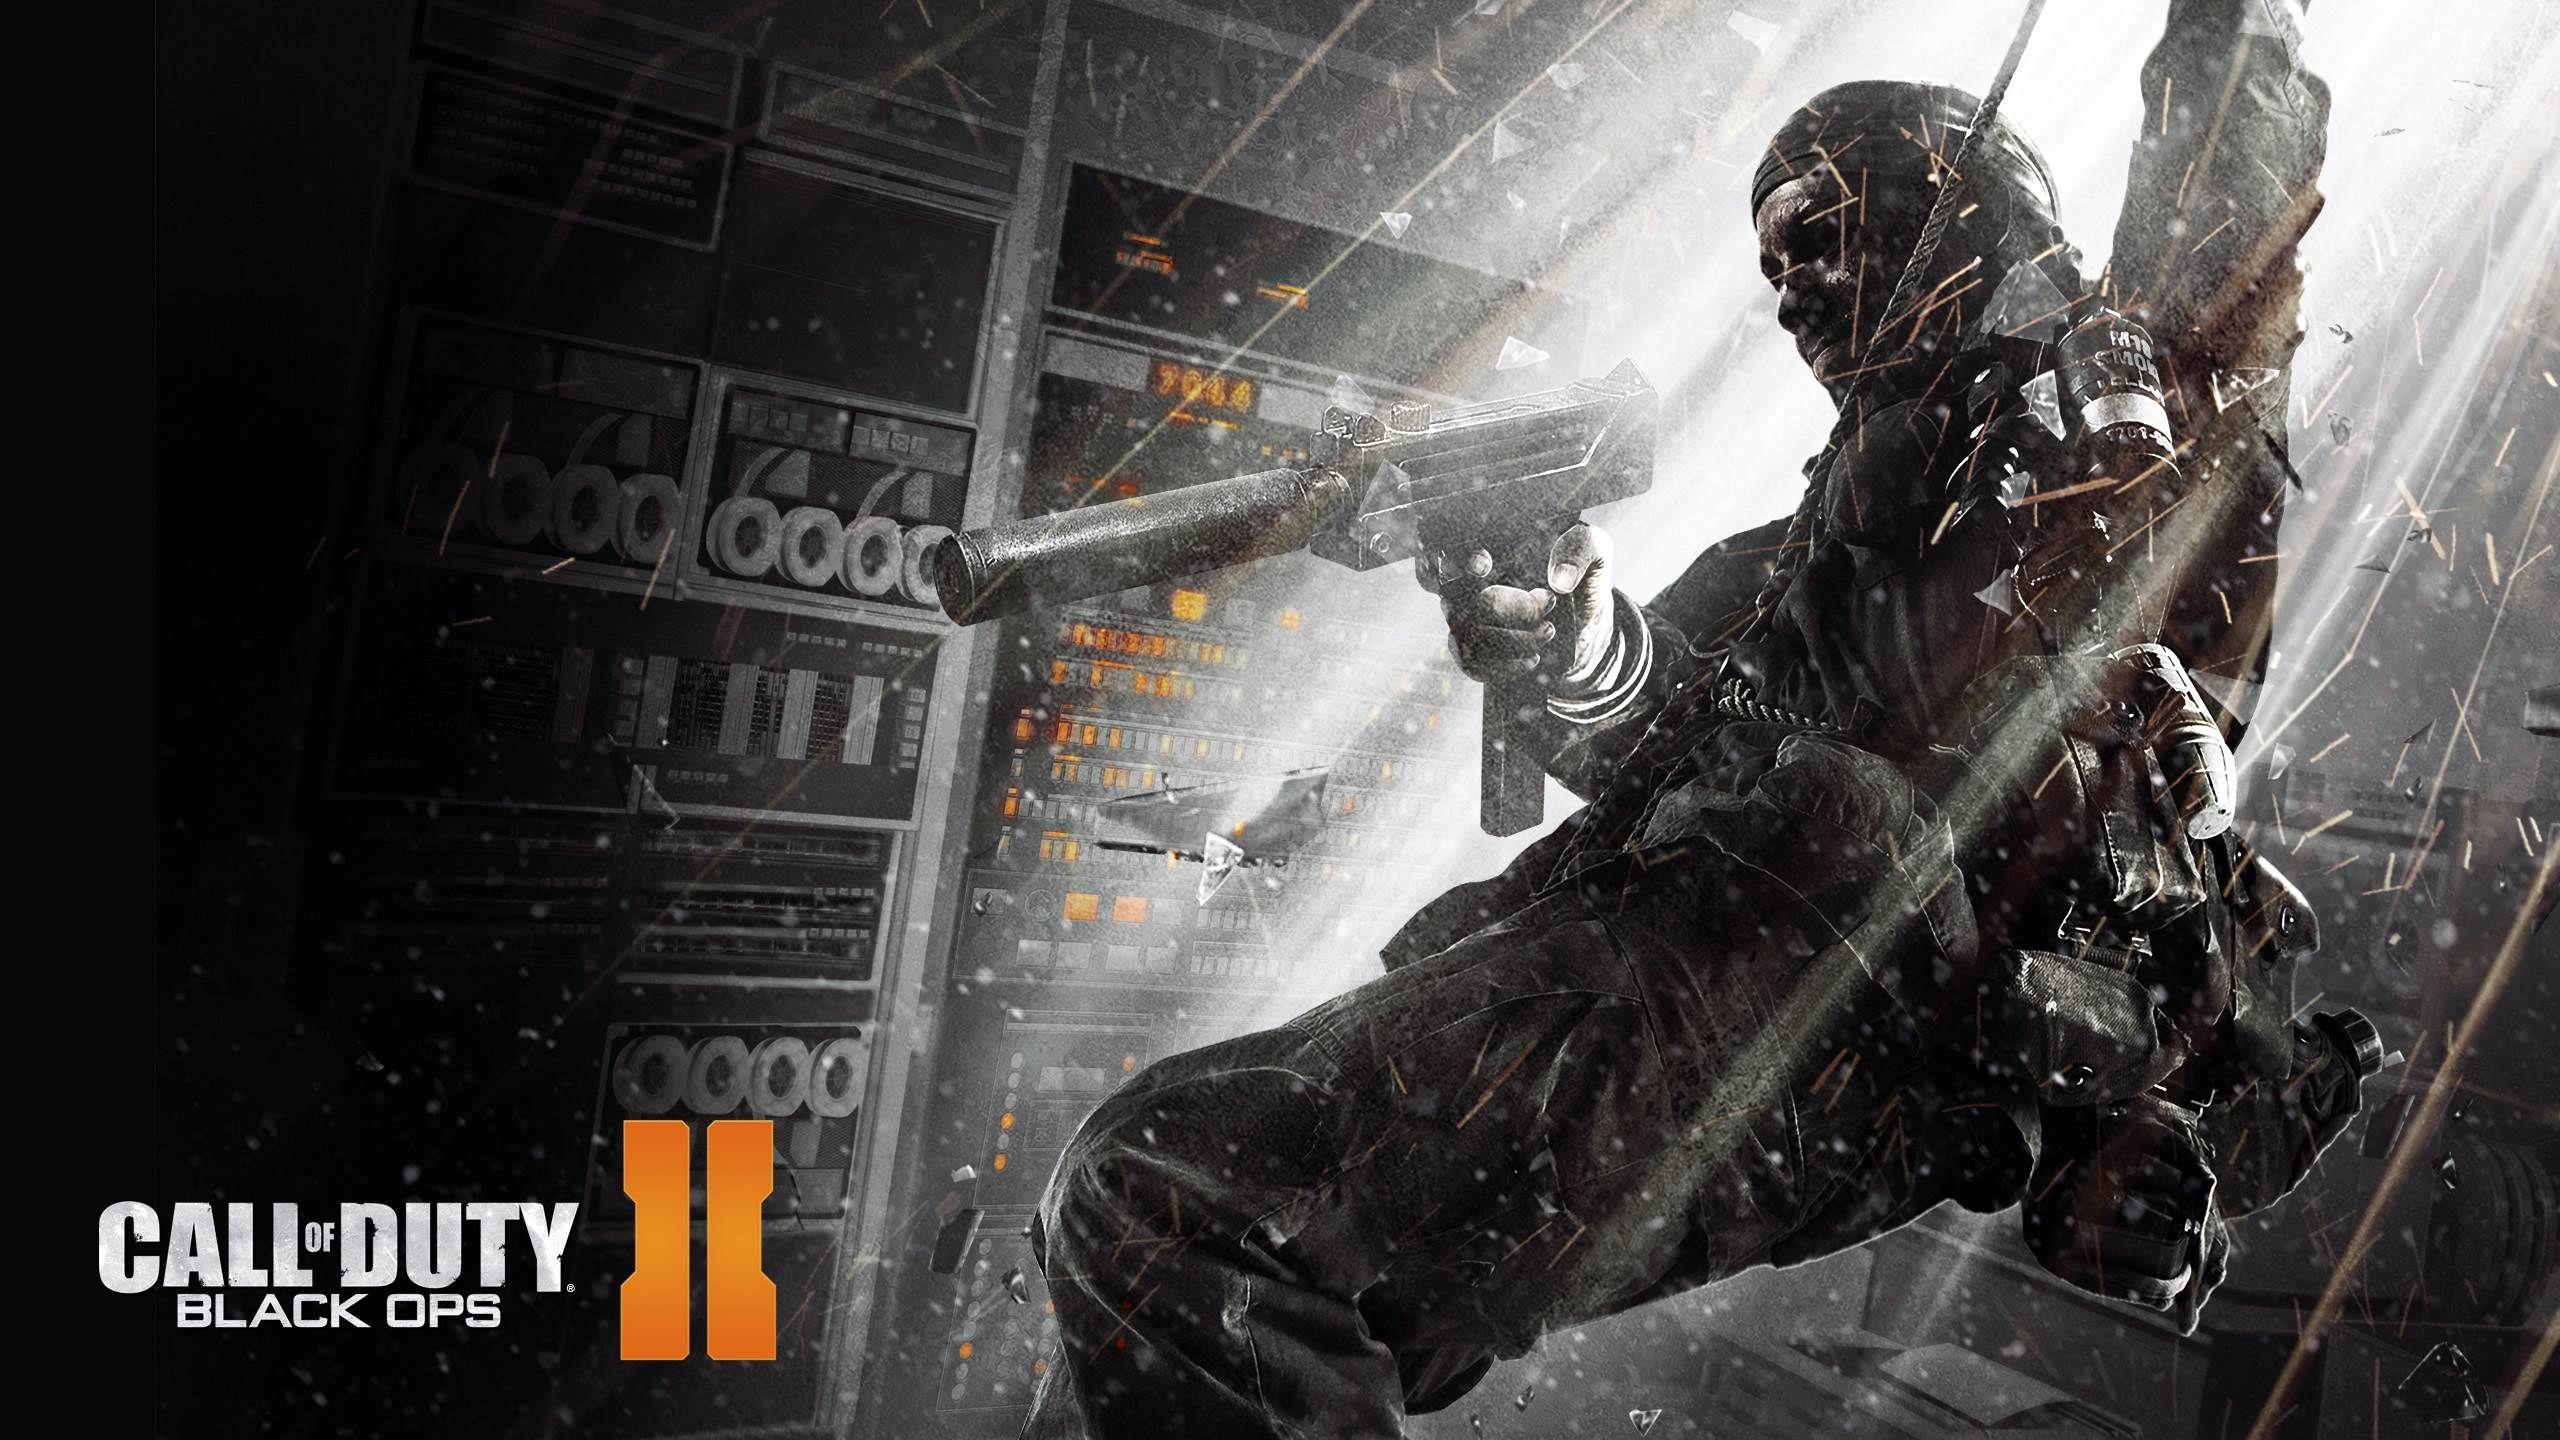 Call Of Duty Black Ops Ii Hd Desktop Wallpaper Widescreen High